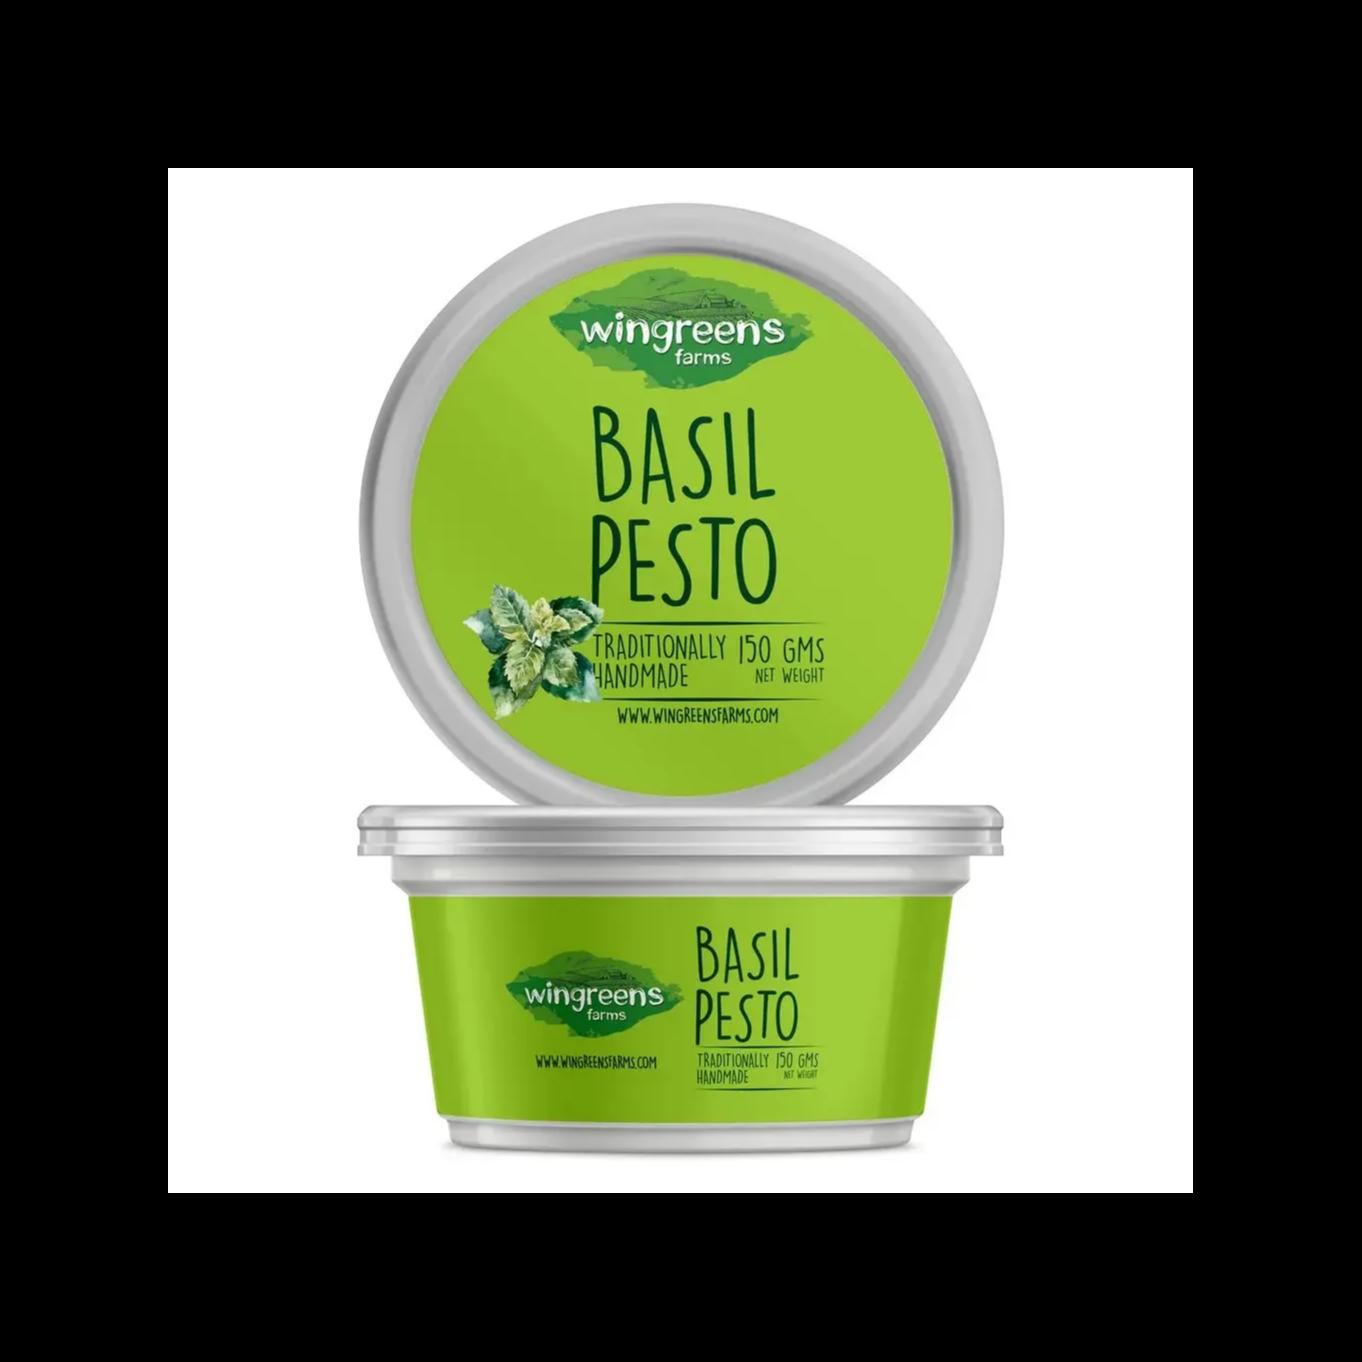 Healthy Snacks - Basil Pesto